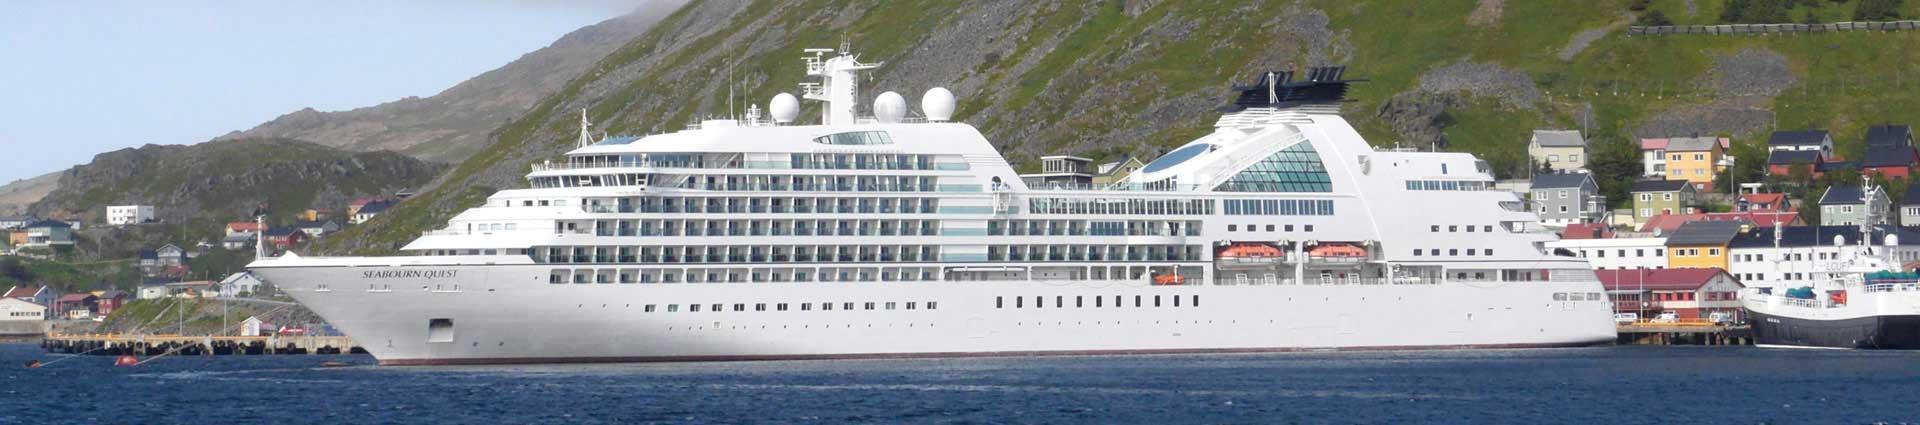 Seabourn Quest